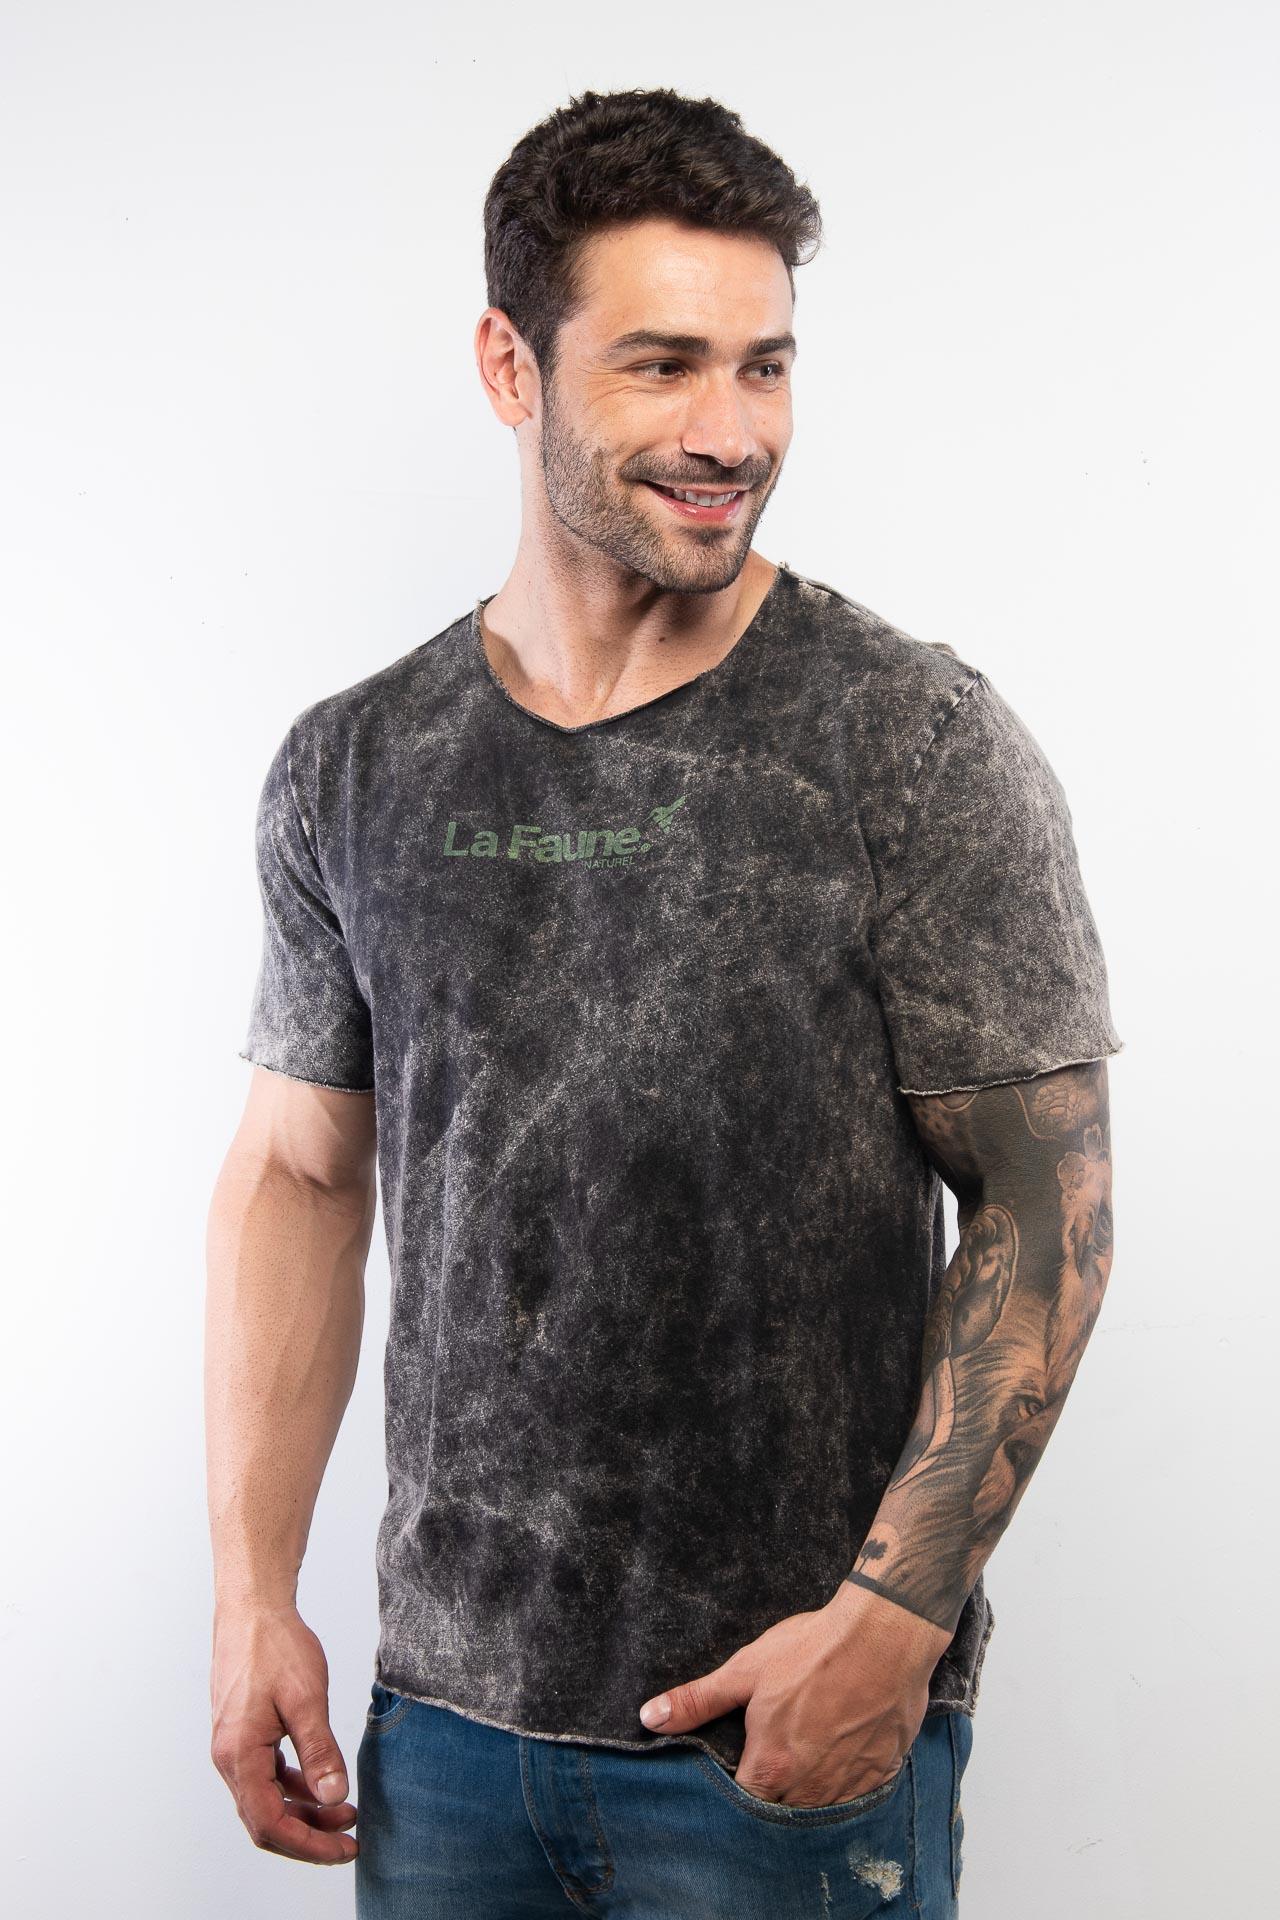 Camiseta Masculina TXC La Faune 1879